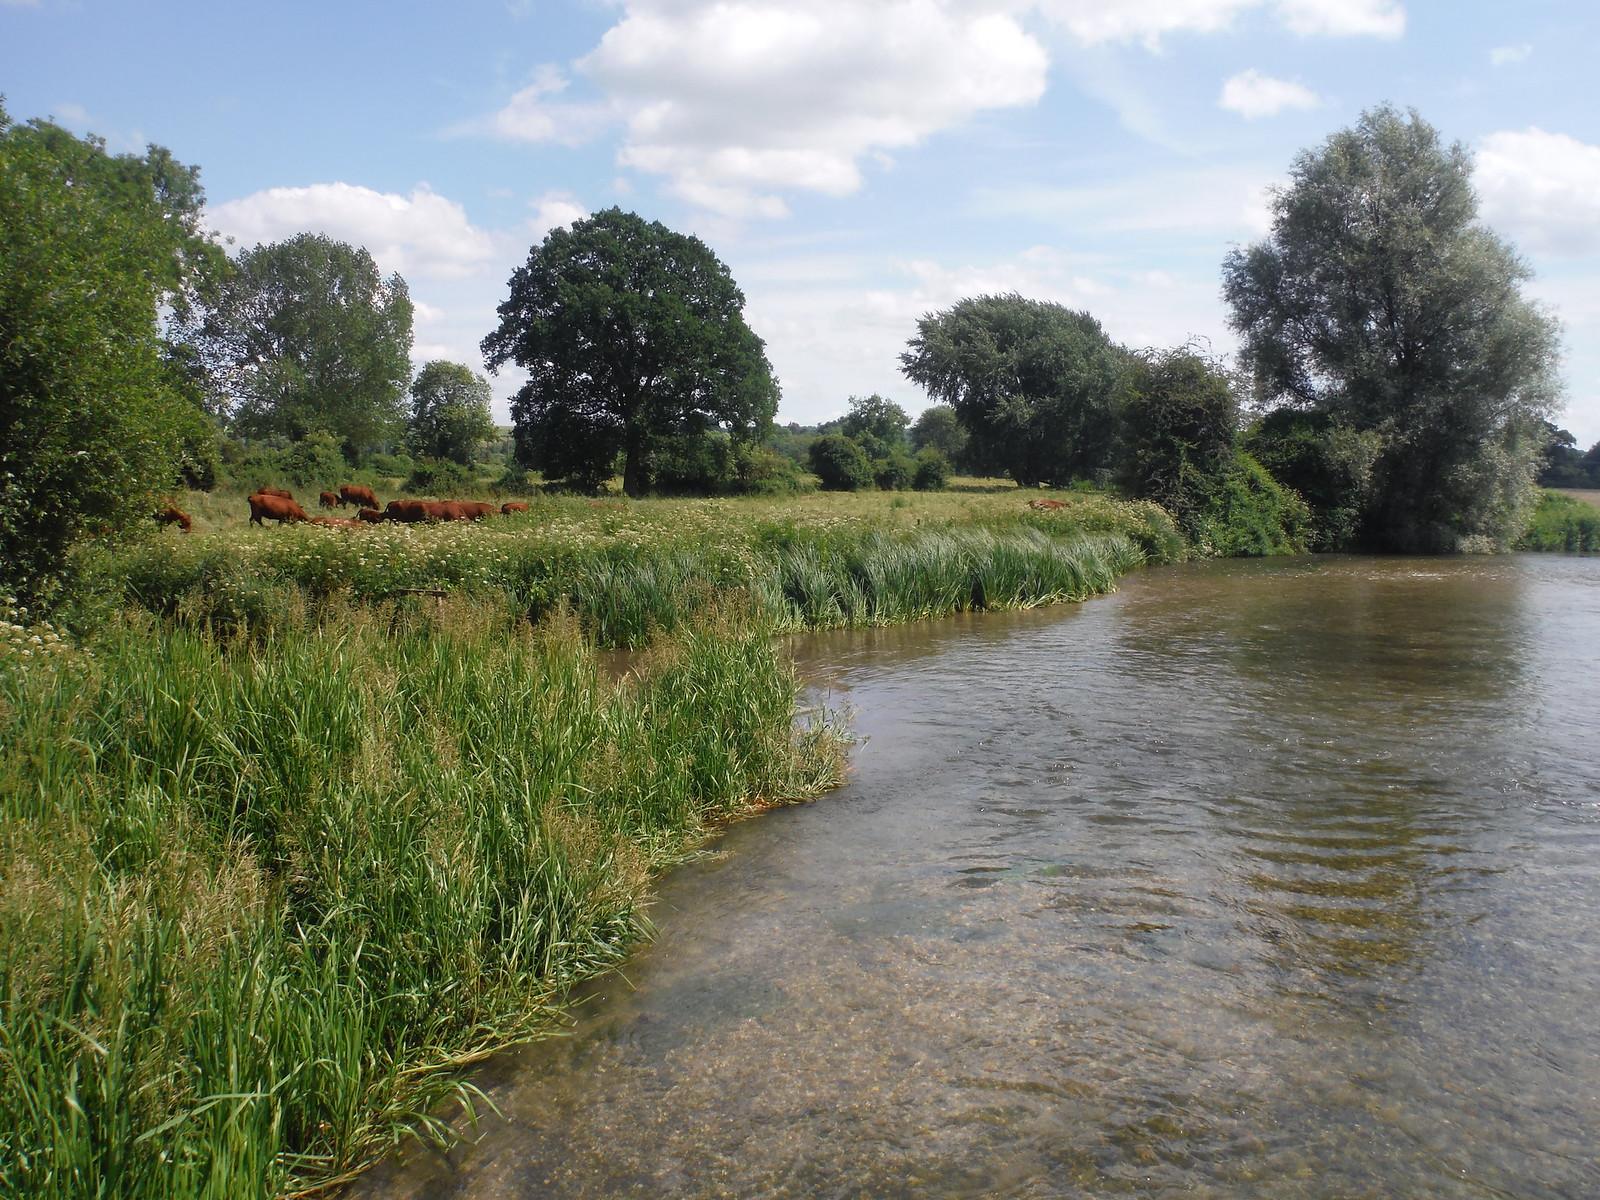 From River Test Bridge, Houghton SWC Walk 265 - Dean to Mottisfont and Dunbridge